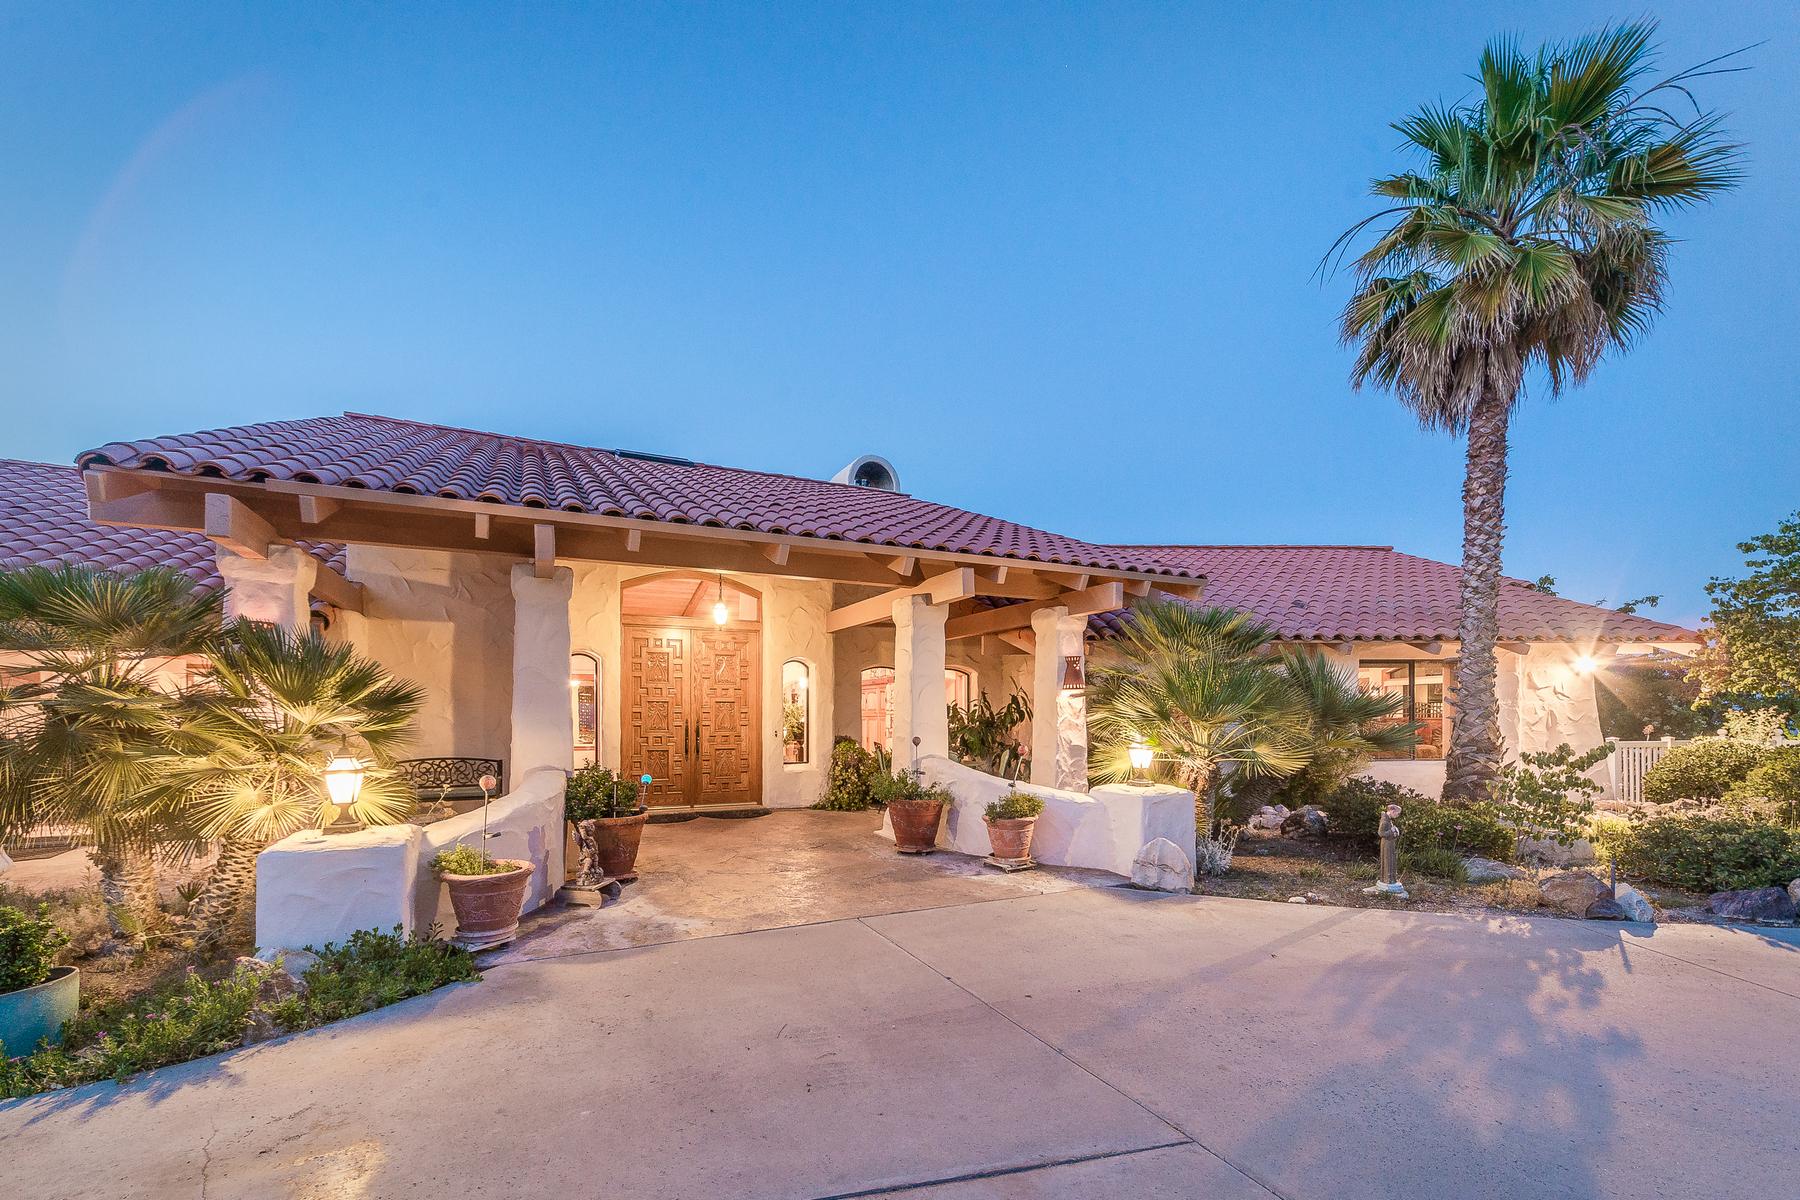 独户住宅 为 销售 在 Positively Stunning West Side Estate 4515 Stags Leap Way Paso Robles, 加利福尼亚州, 93446 美国